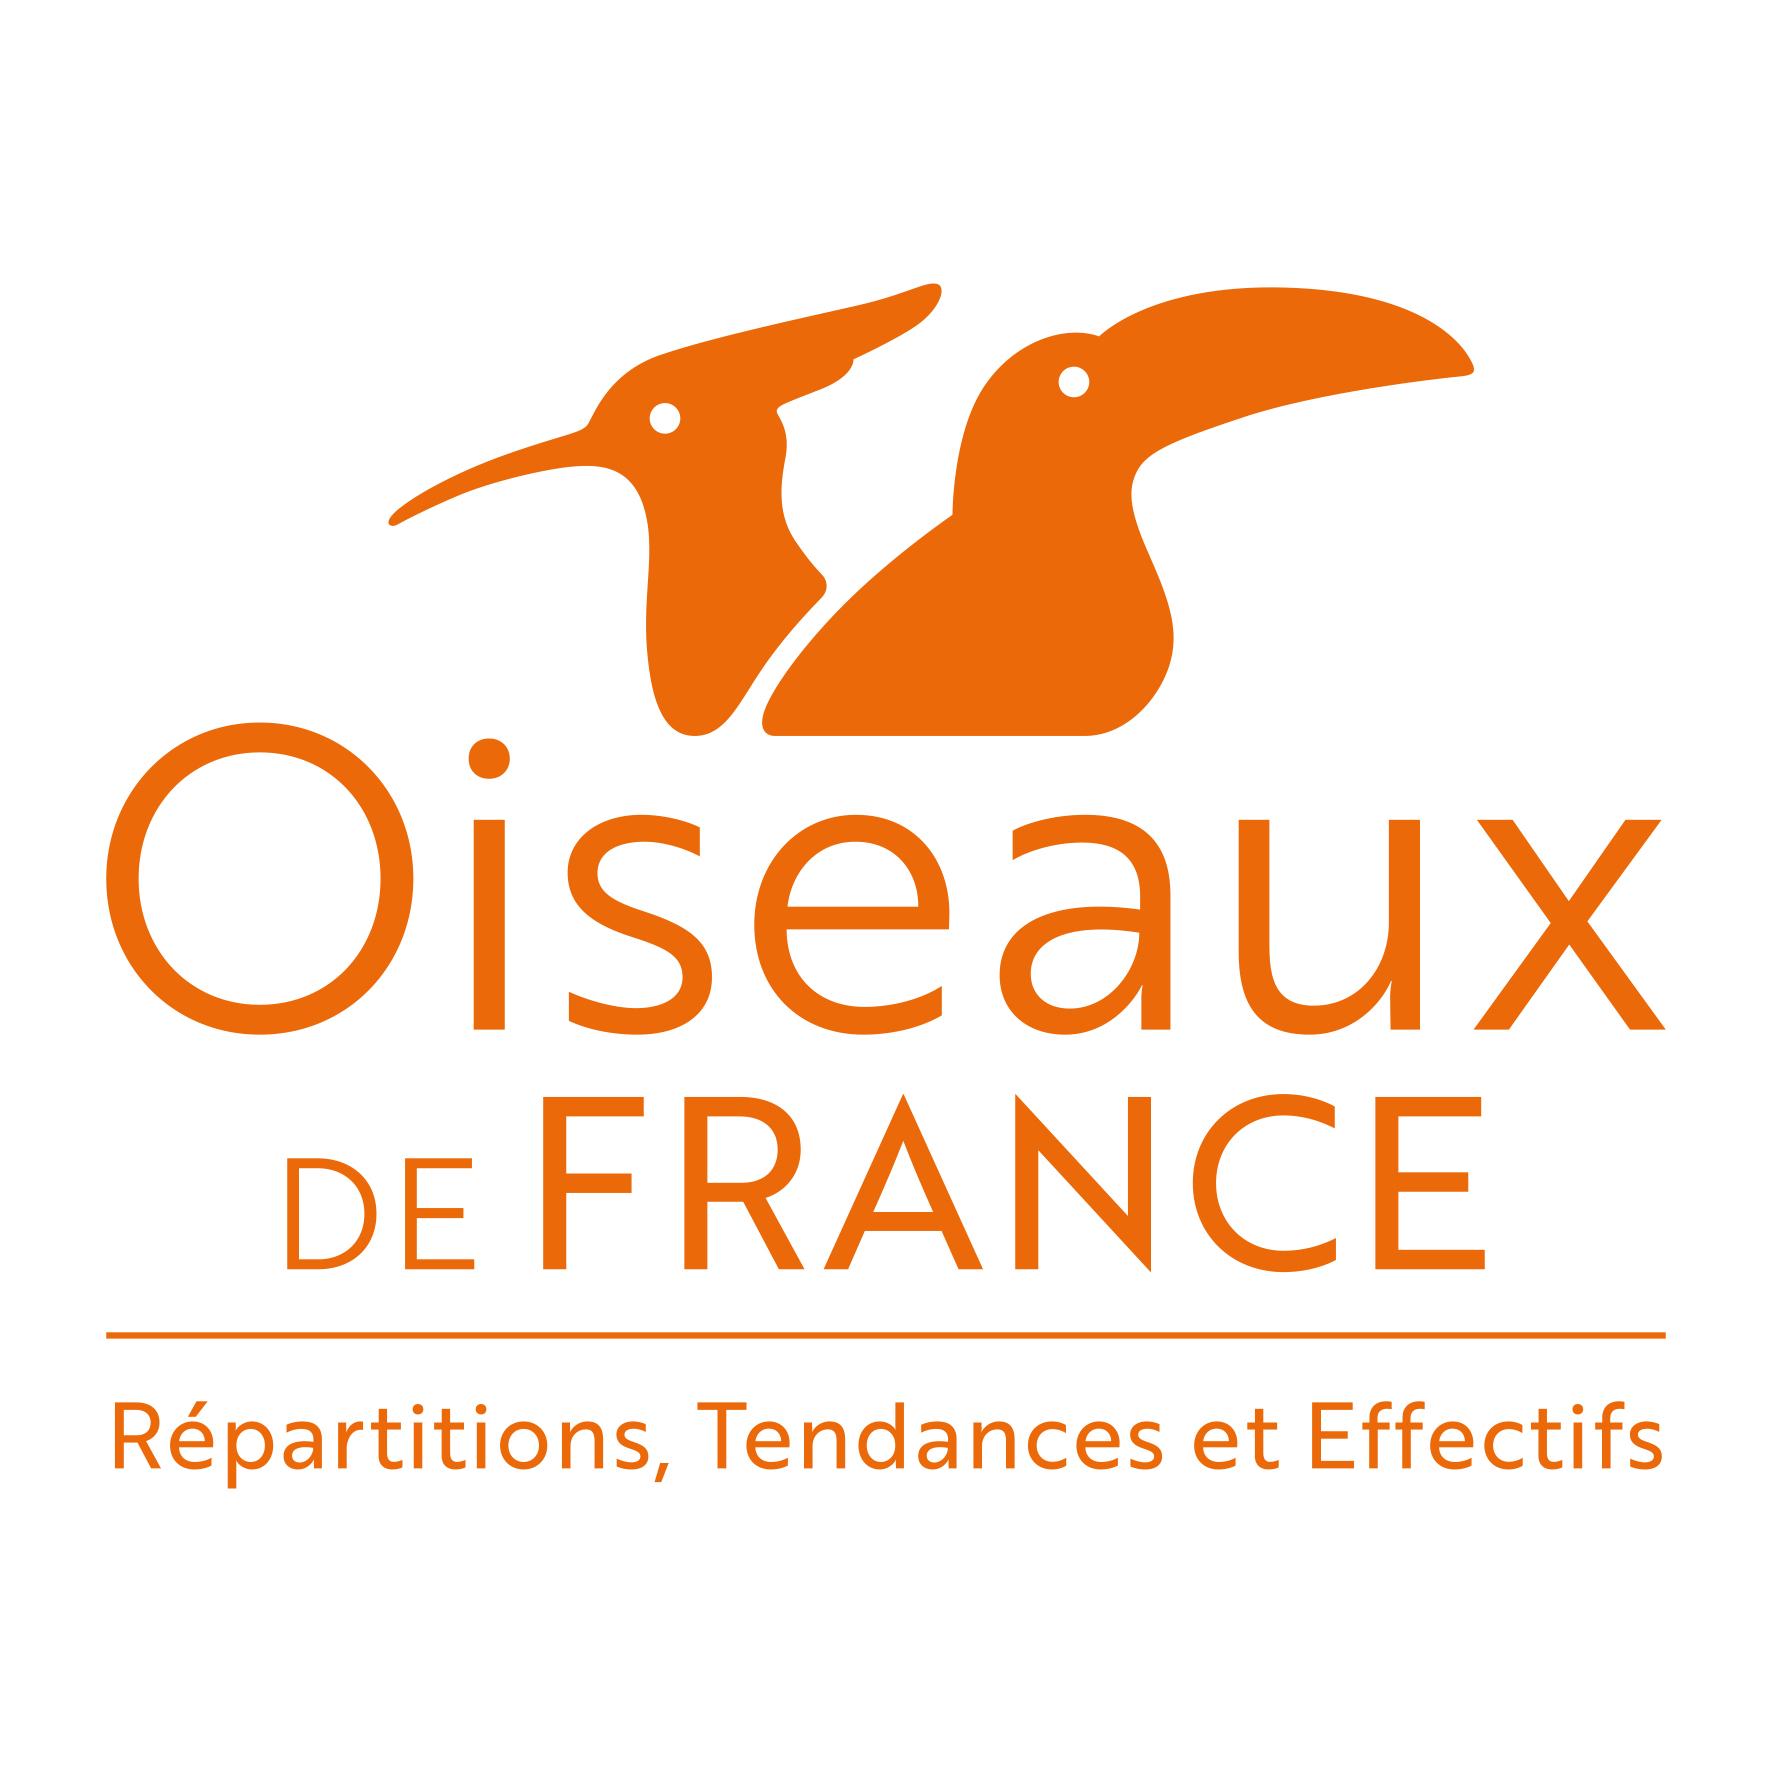 https://cdnfiles1.biolovision.net/www.faune-drome.org/userfiles/photo/LogoOiseauxDeFrance.jpg